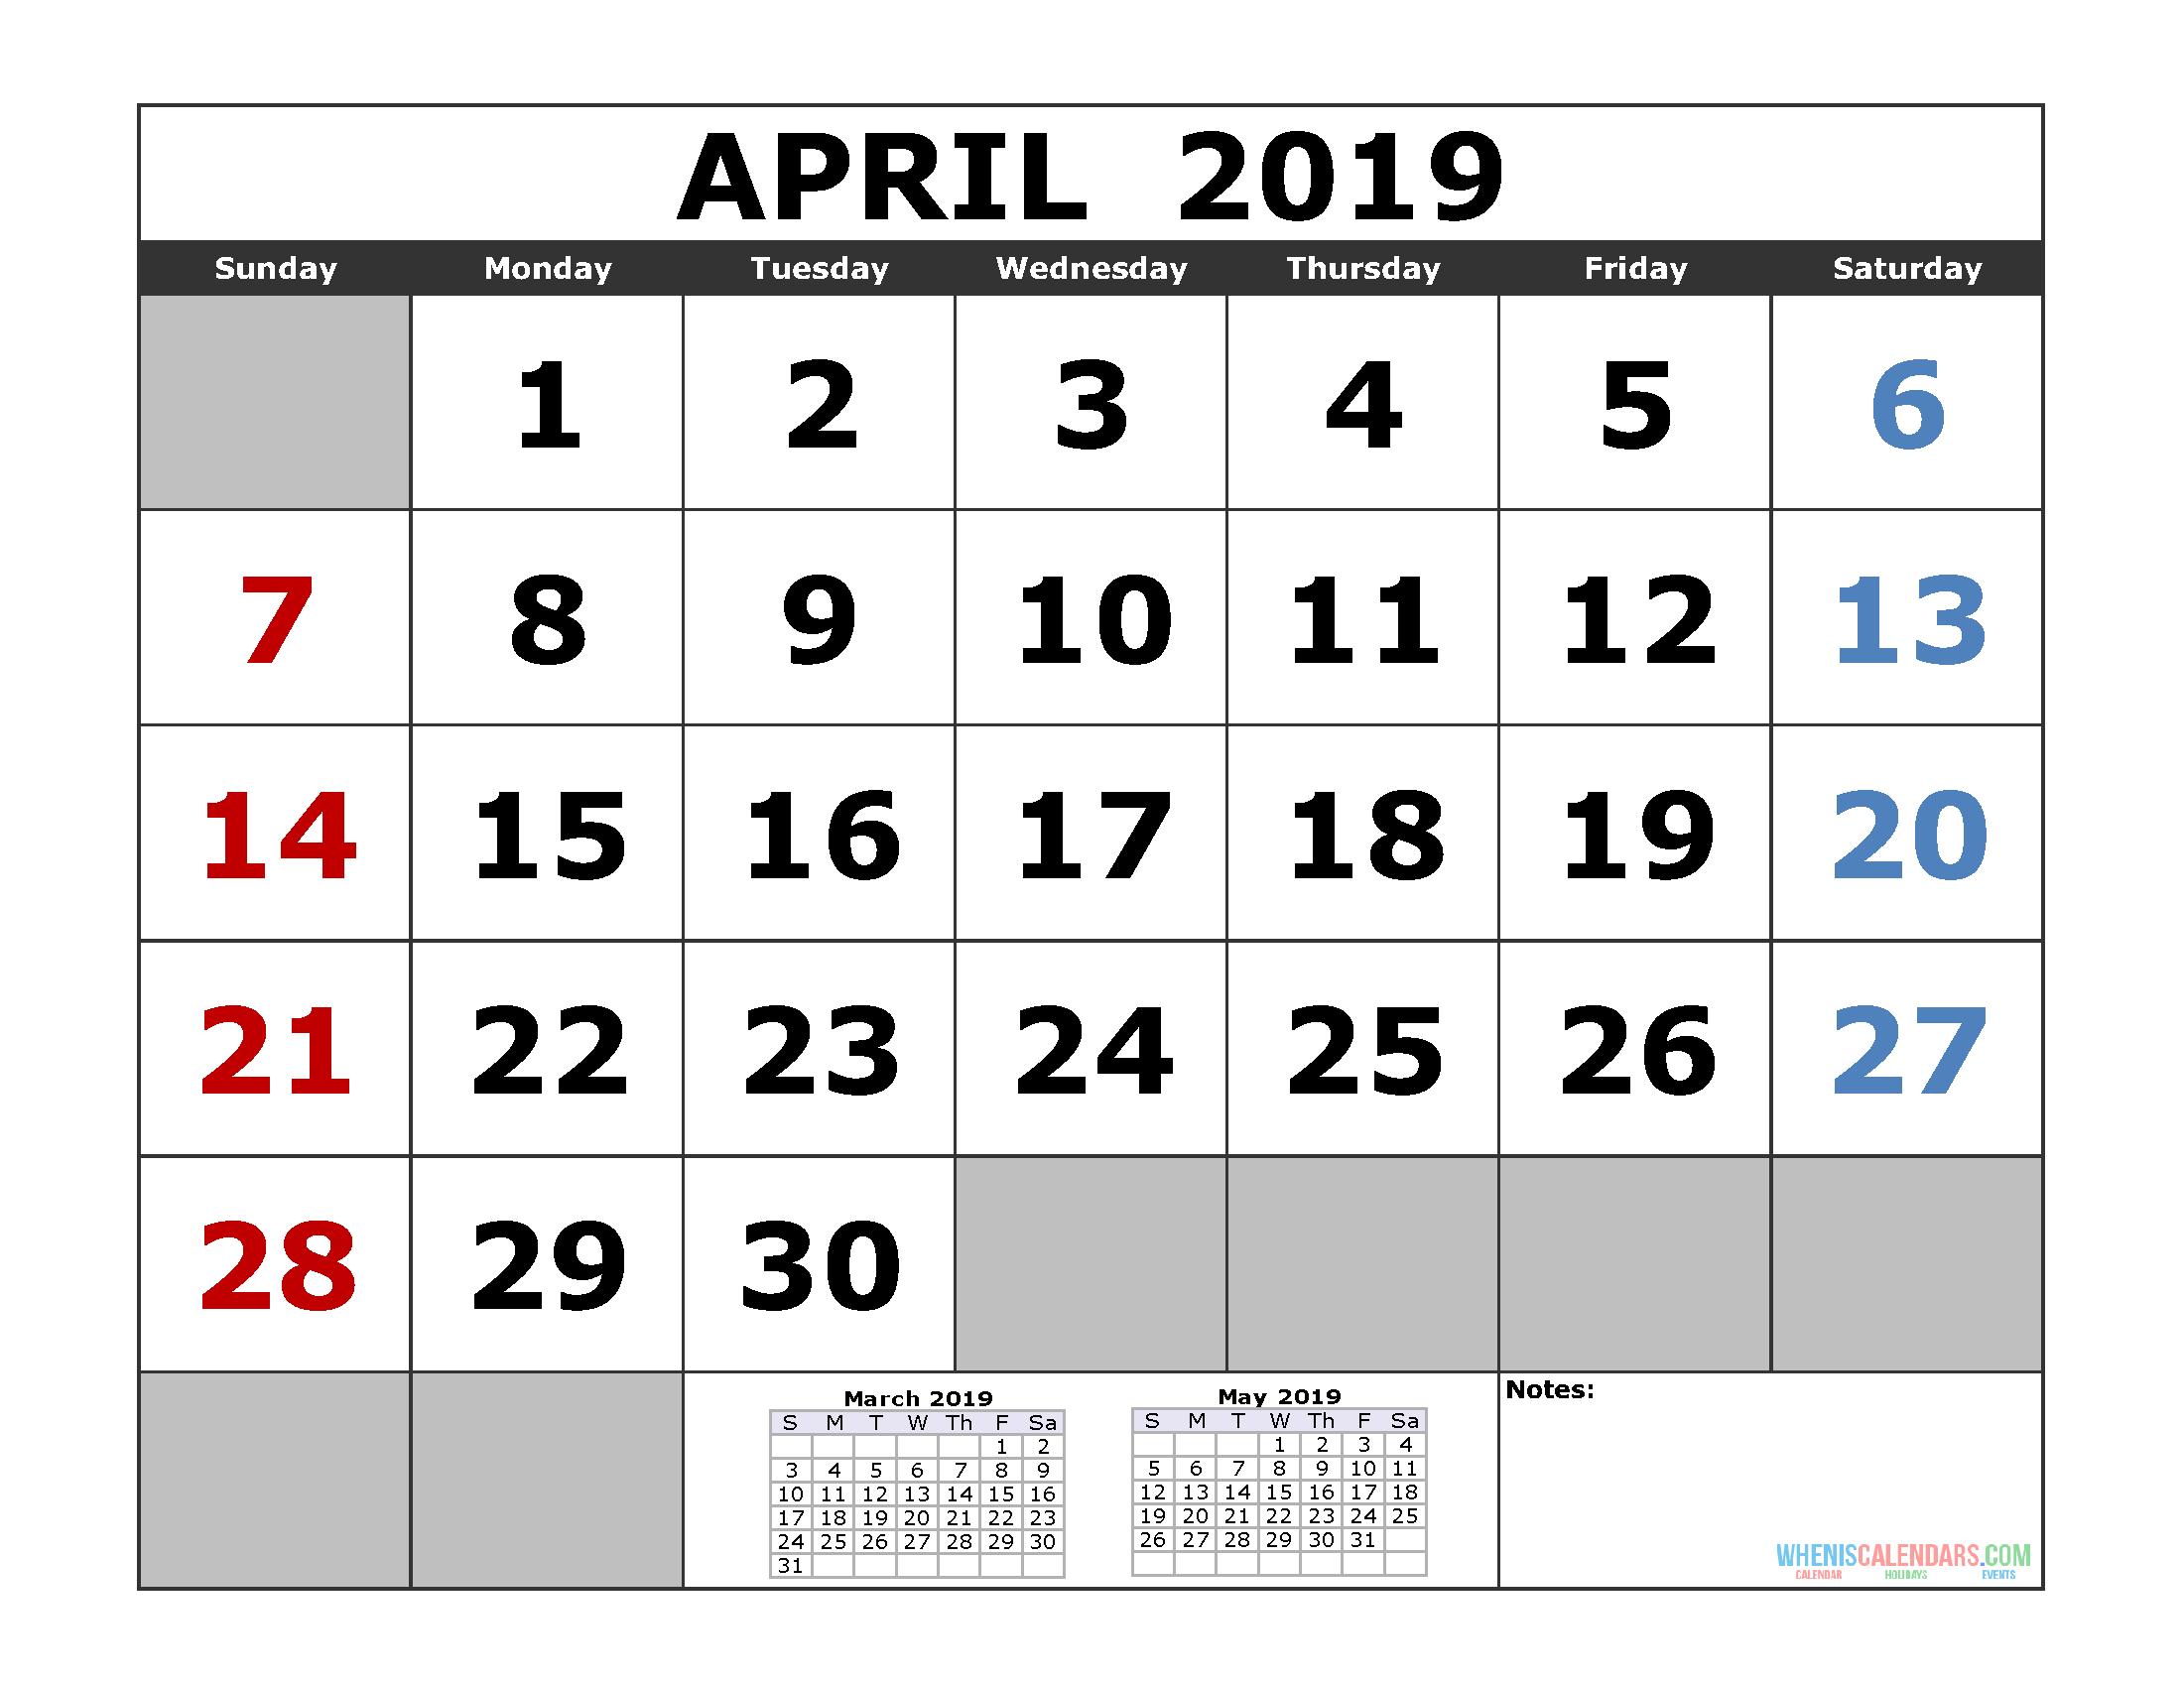 April 2019 Printable Calendar Template (3 Month Calendar) | Free within Printable 3 Month April May June Calendar Template